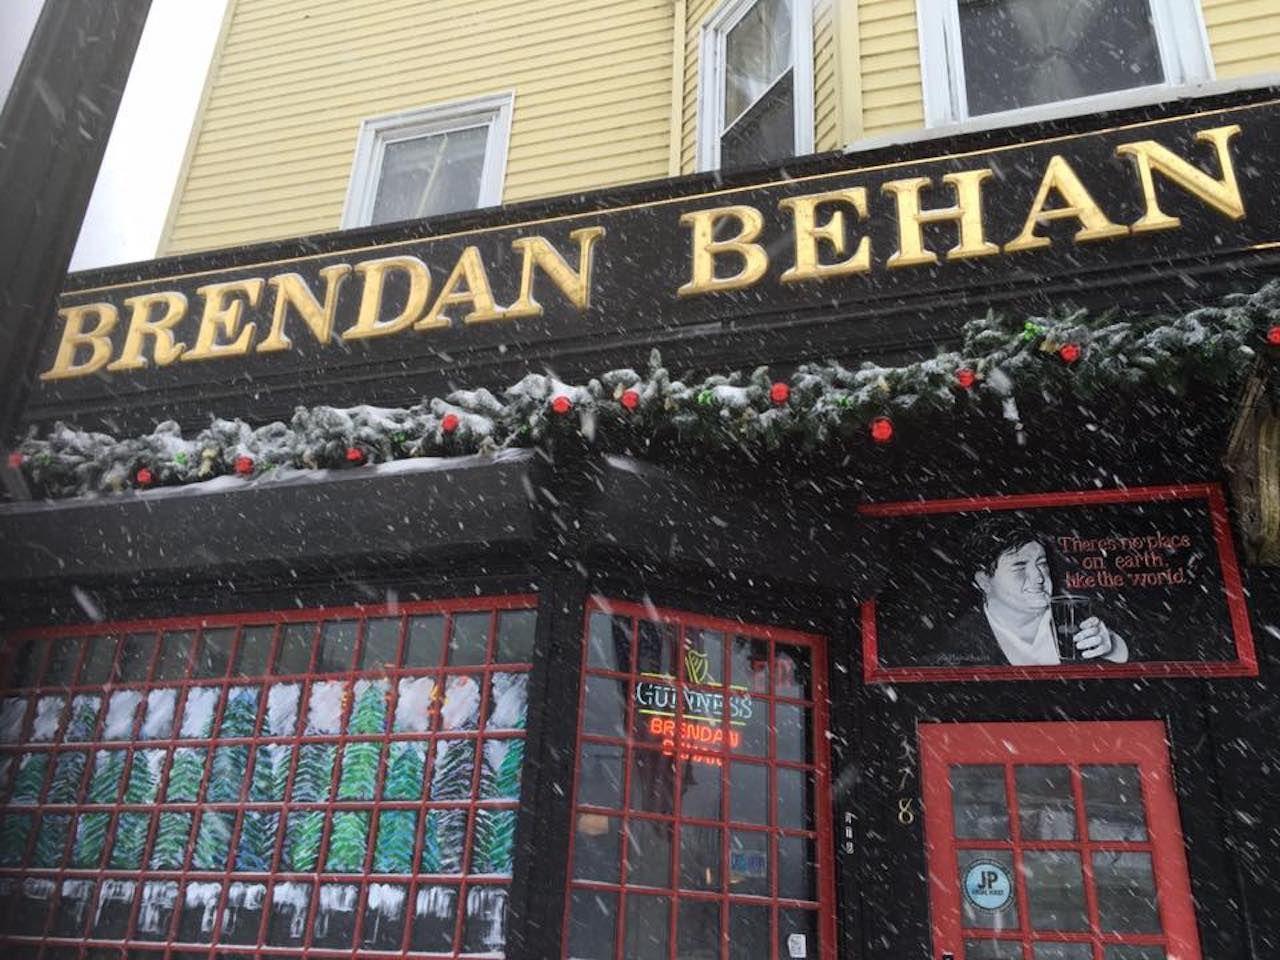 The Behan